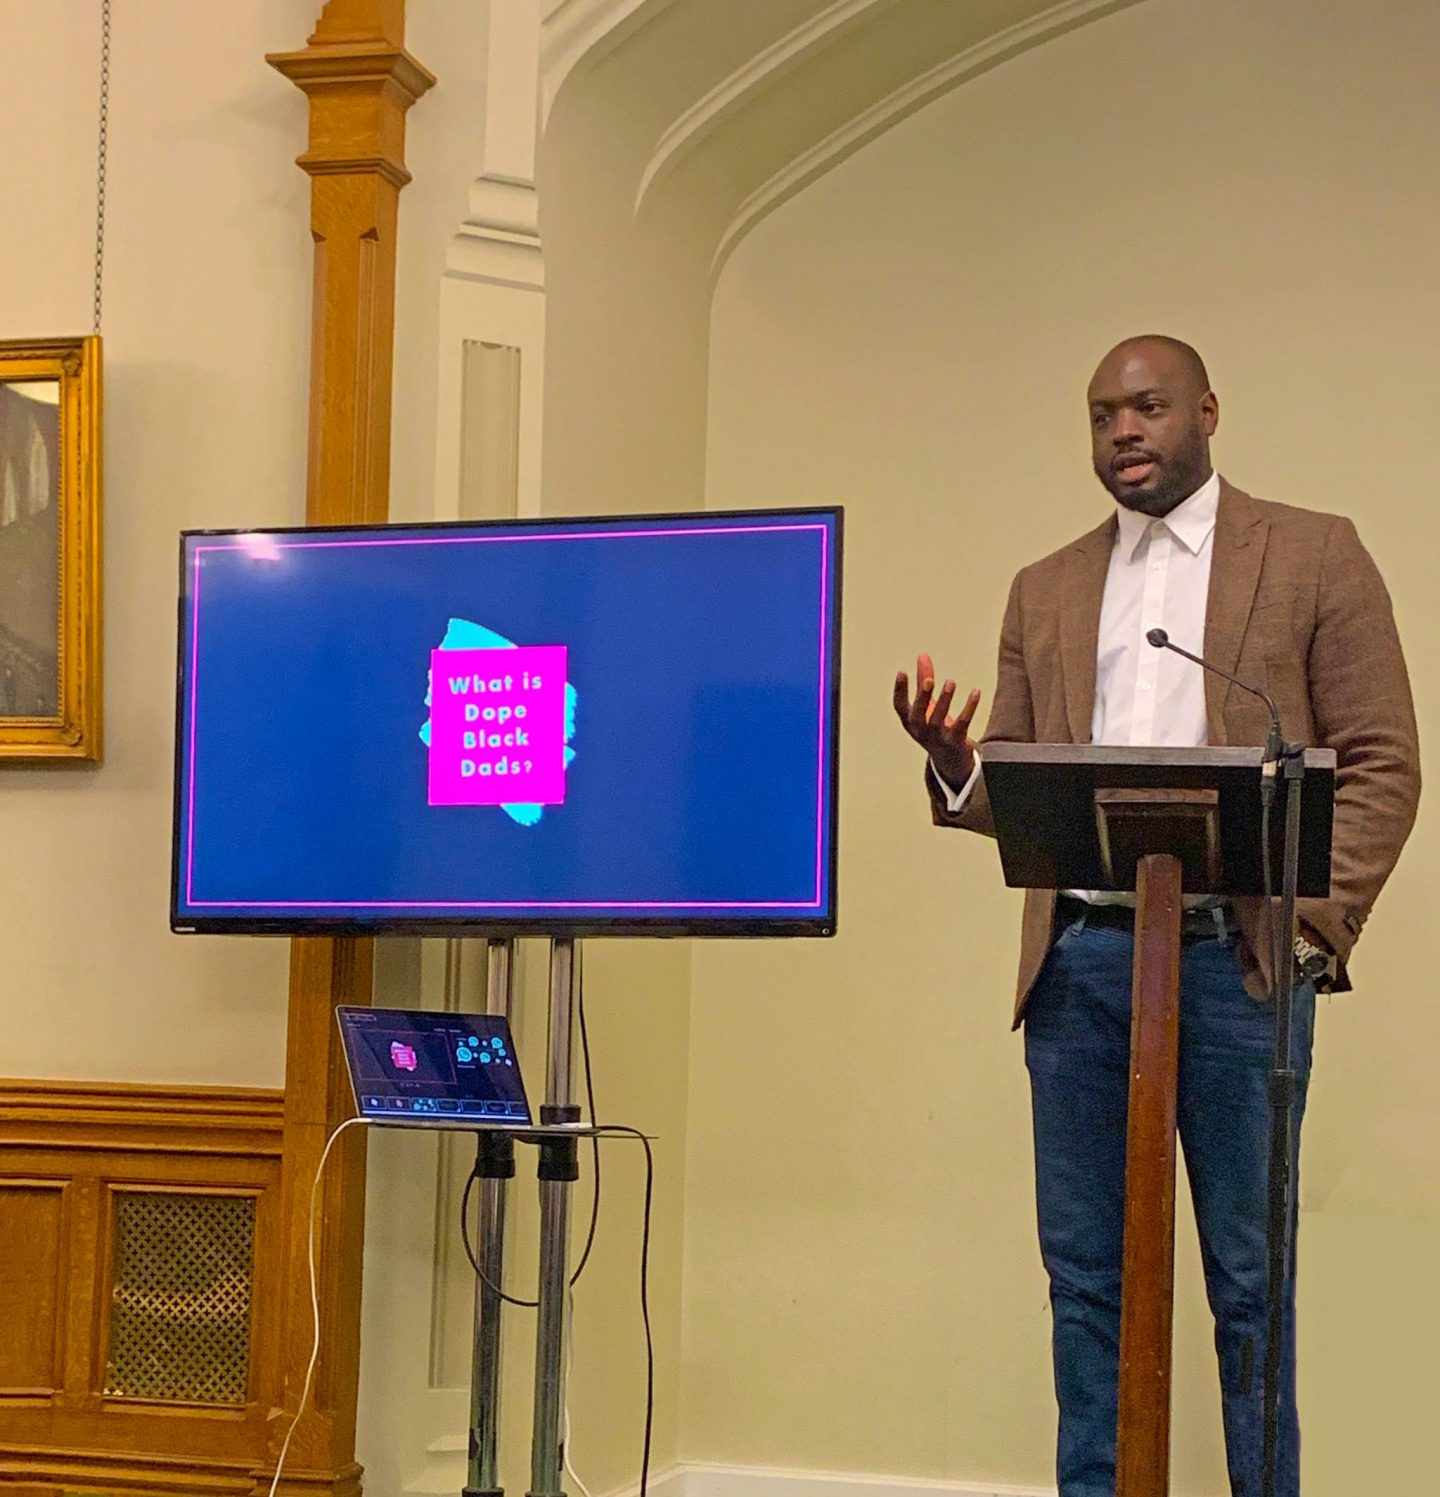 Q&A with Marvyn Harrison of Dope Black Dads - Dad Blog UK